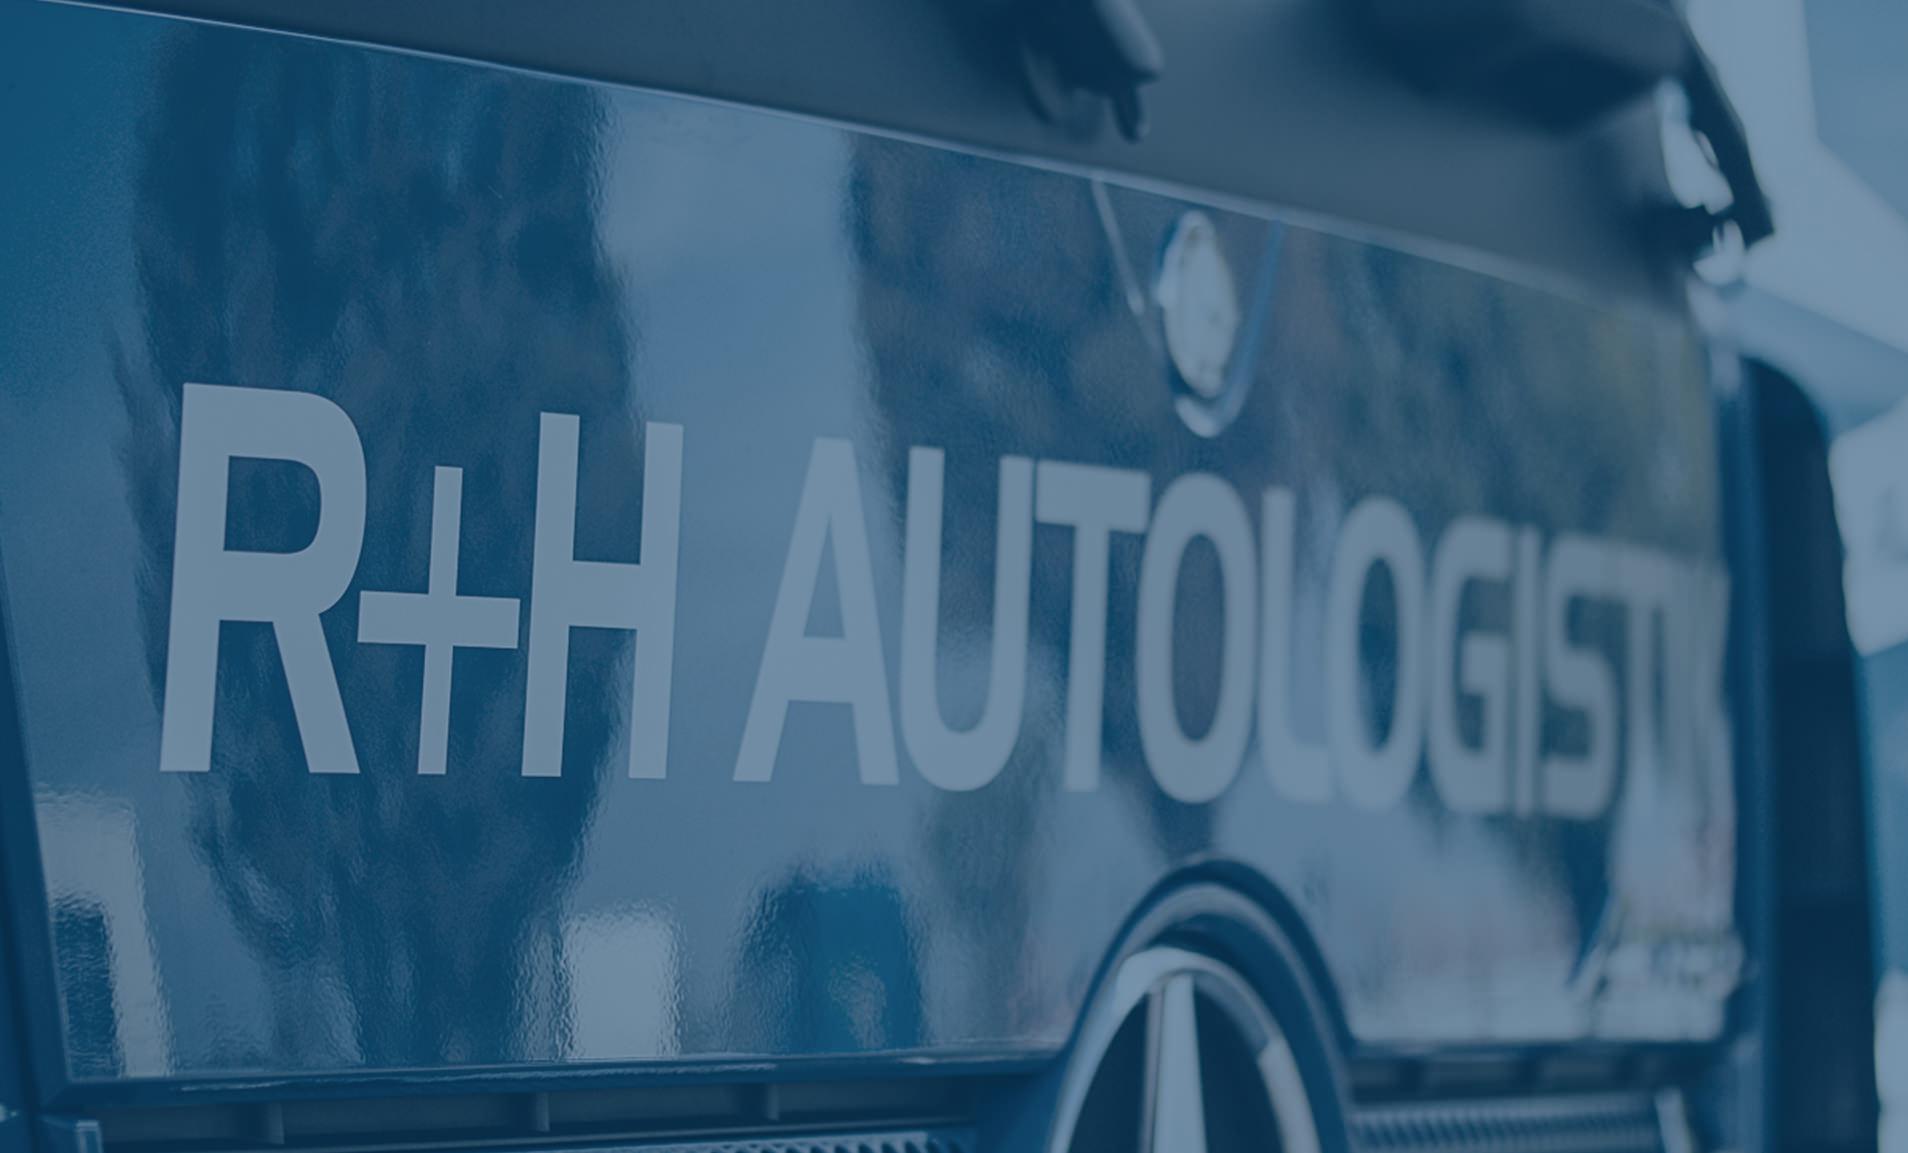 r-h-autologistik-slider-6